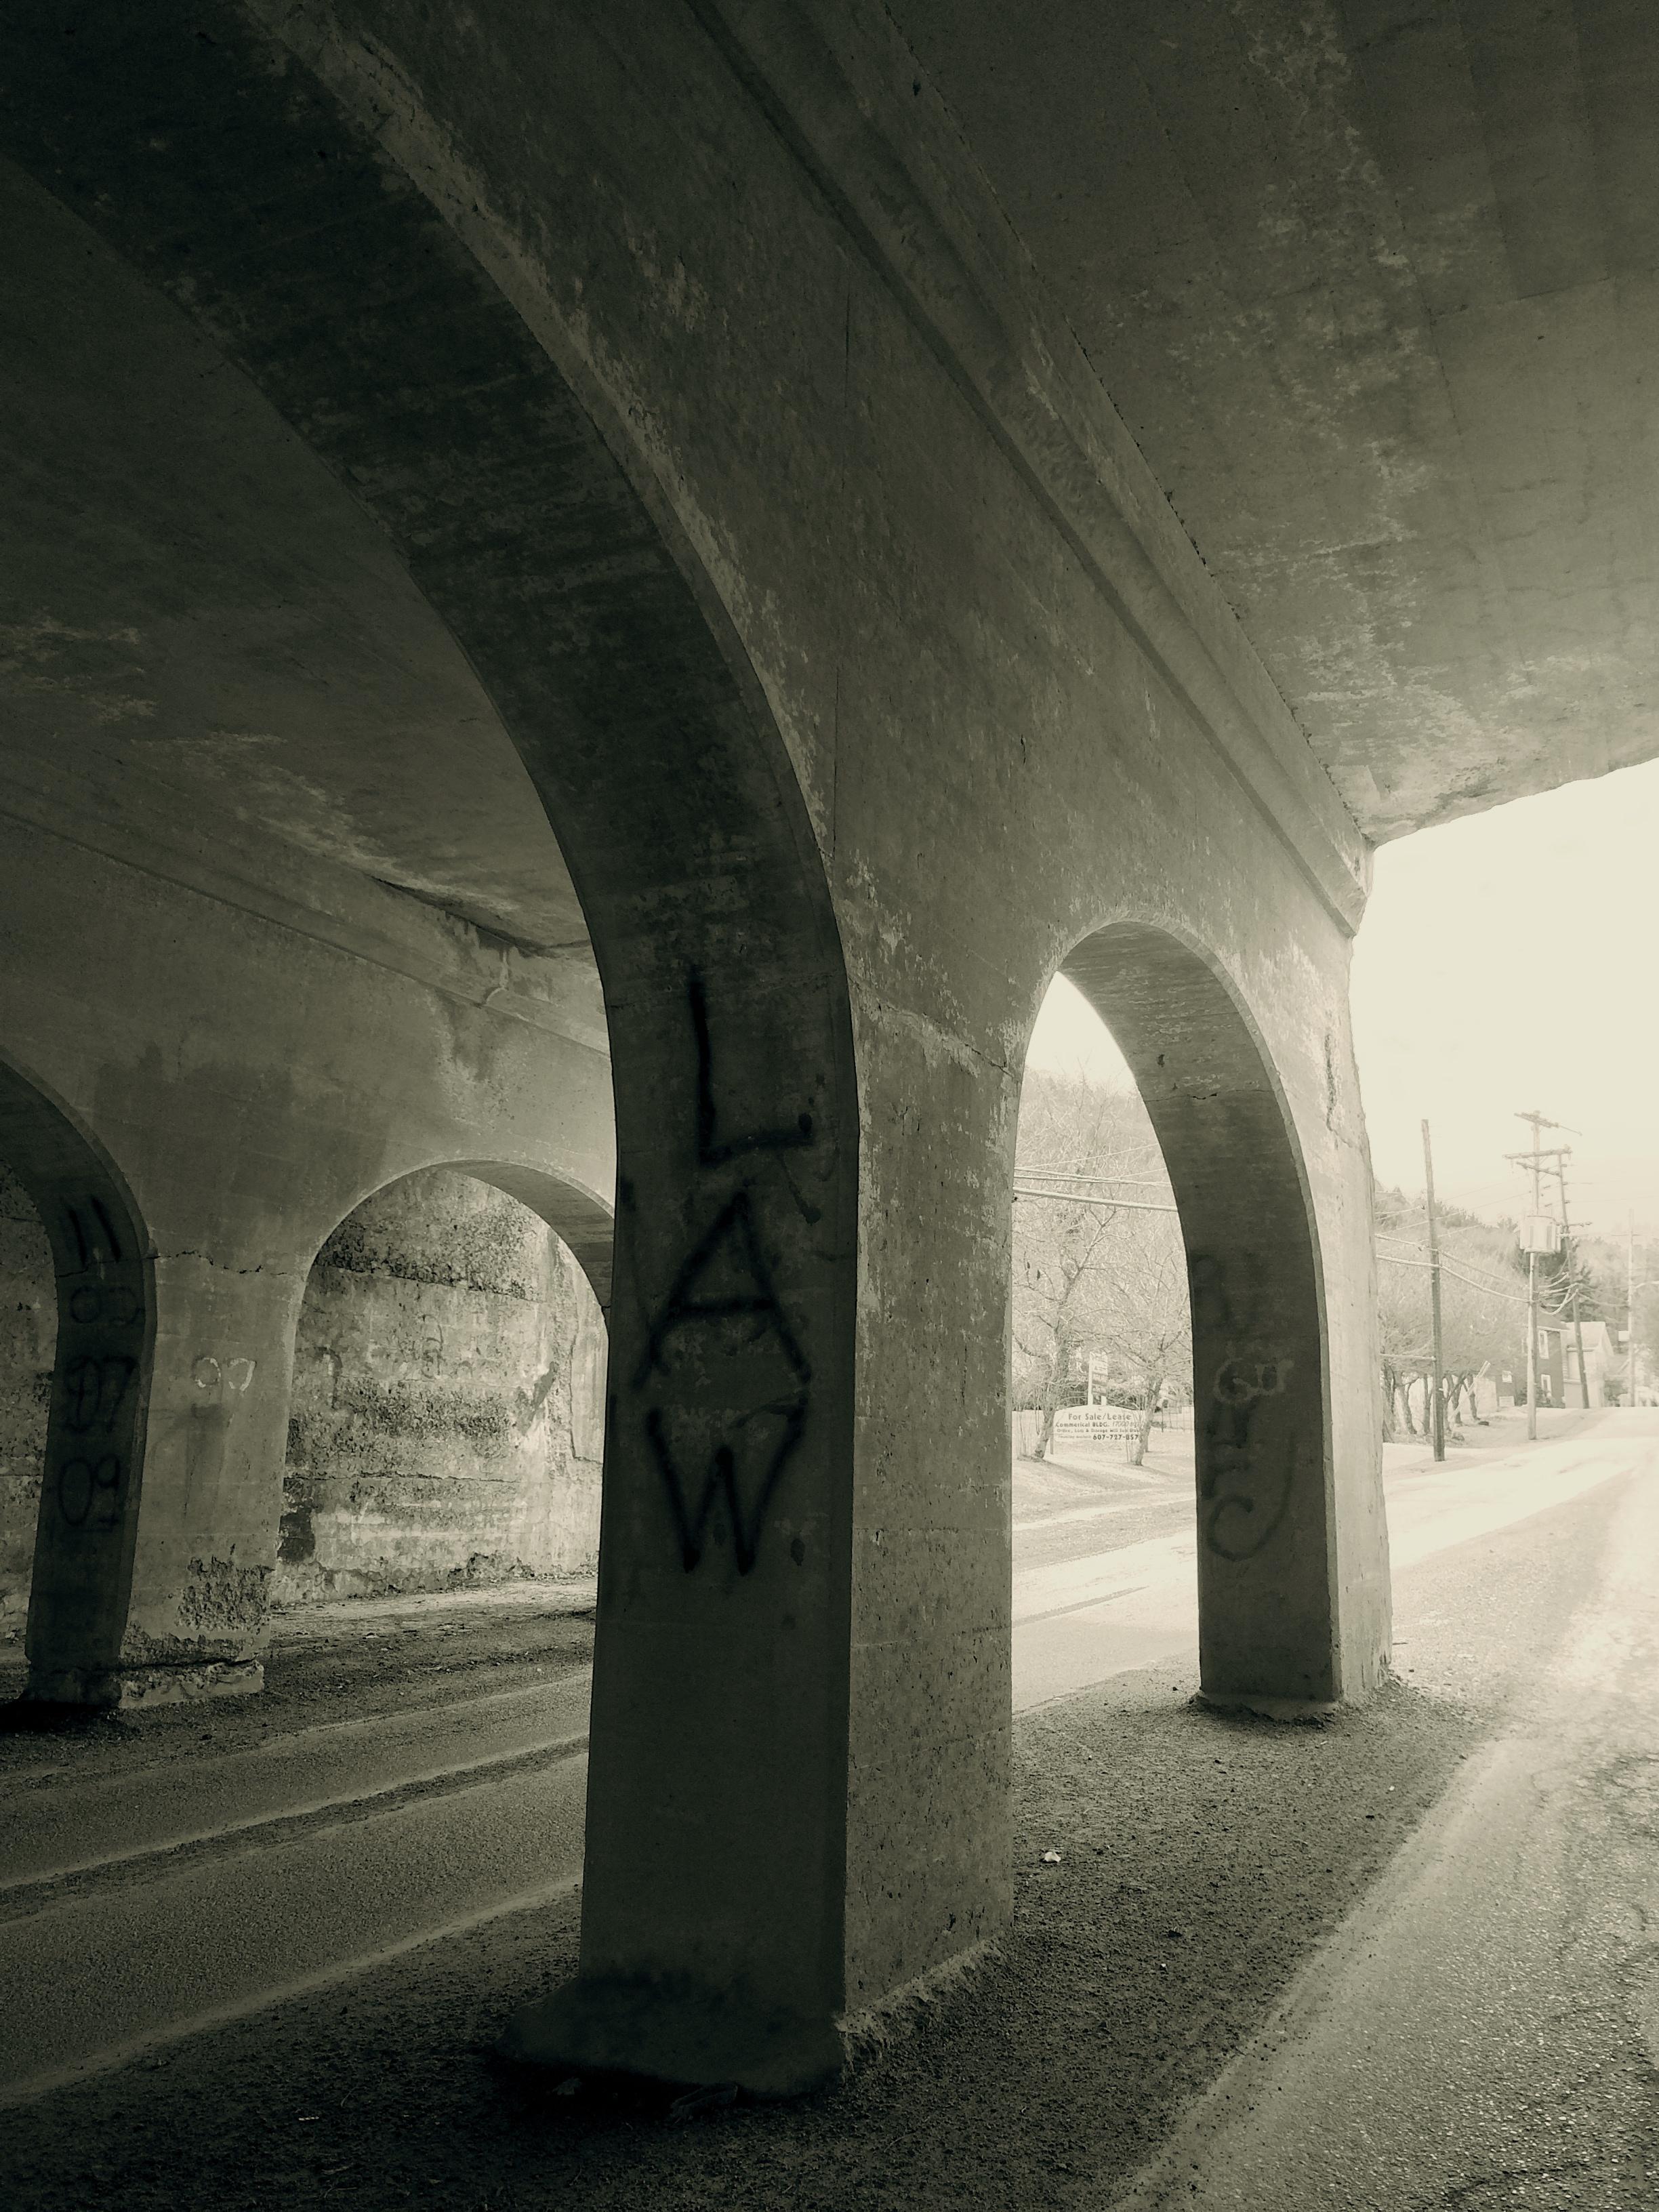 THE INSIDE BRIDGE